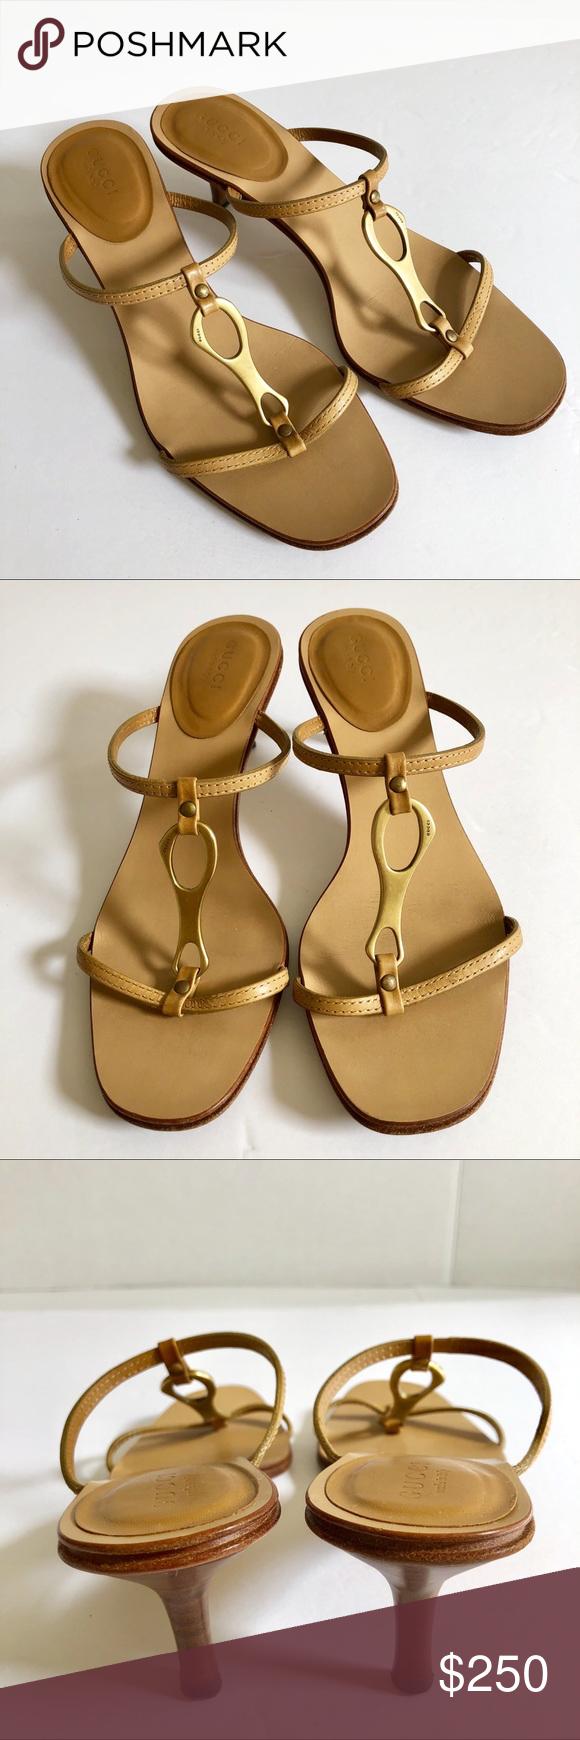 b2db4e20157 Gucci Leather Strappy Sandal Wooden Kitten Heel Gucci Women's ...